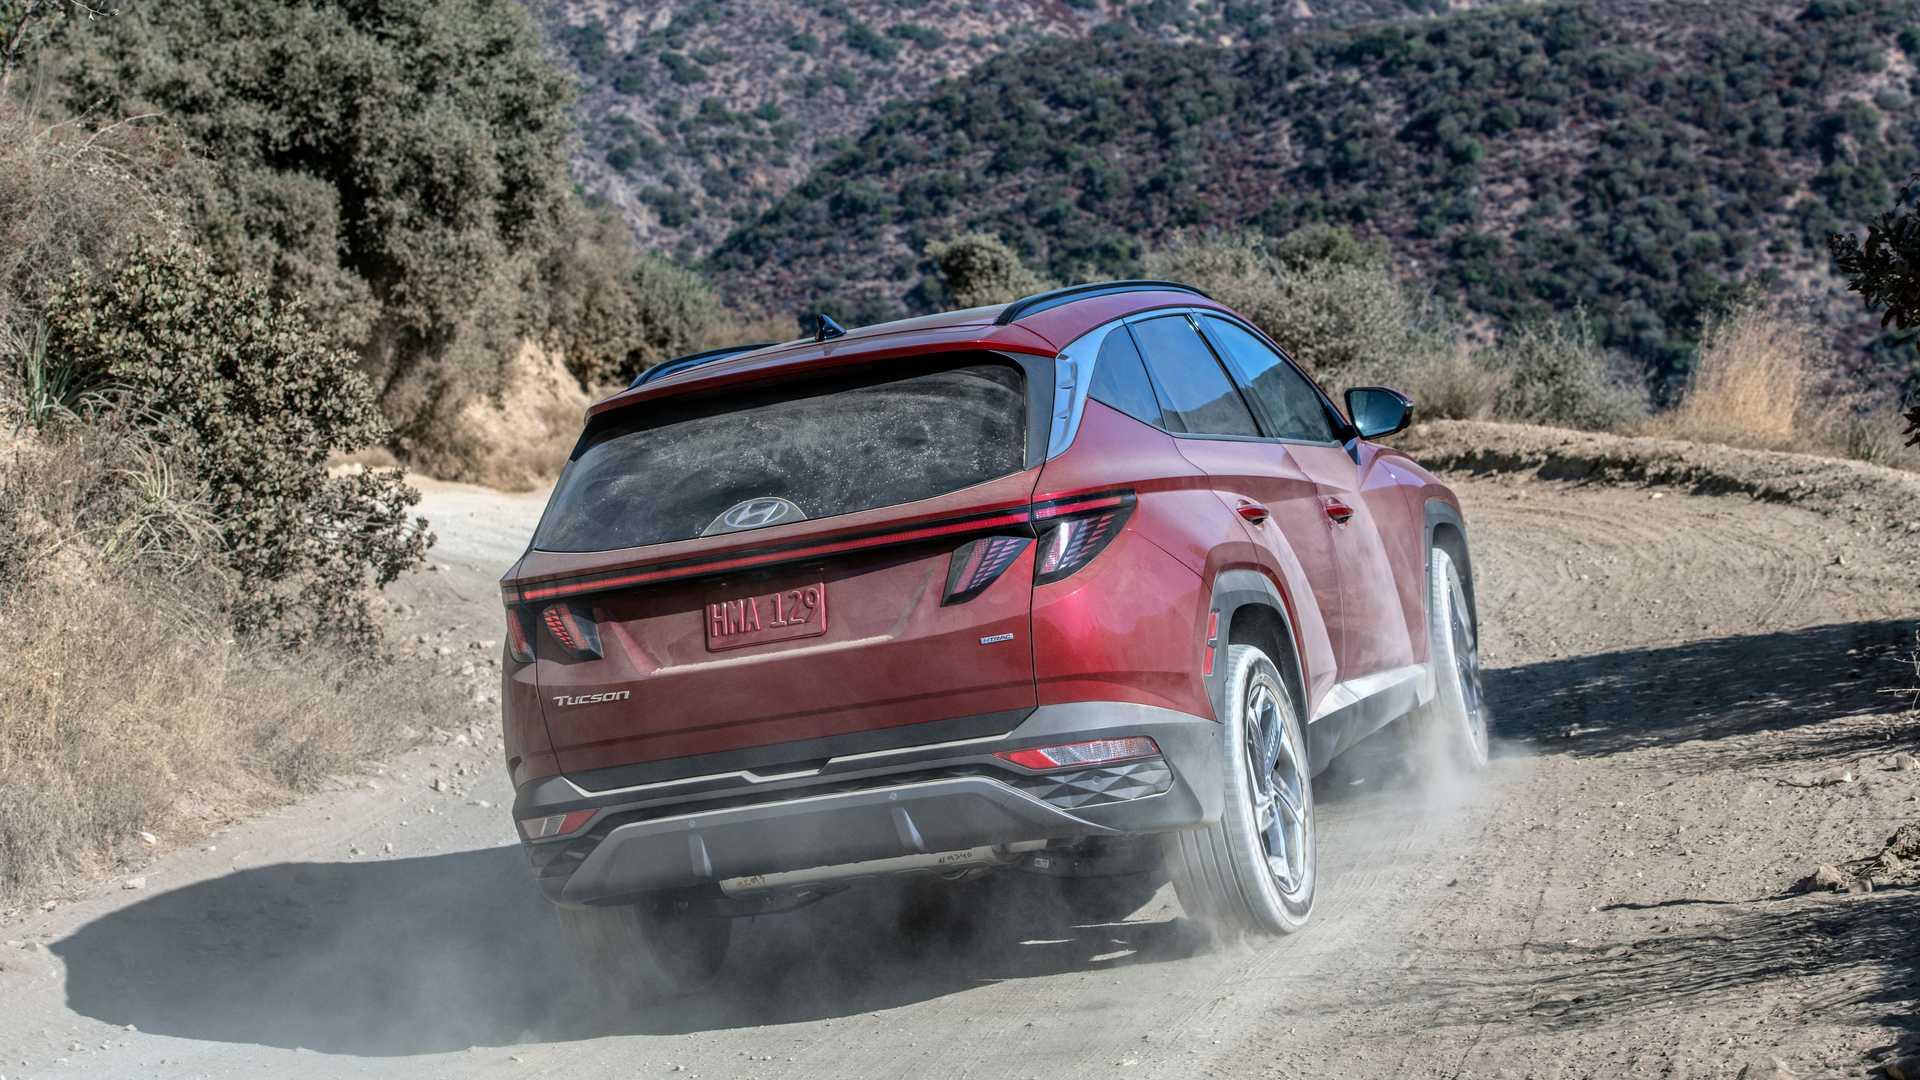 The All New US-Spec Hyundai Tucson Unveiled 5